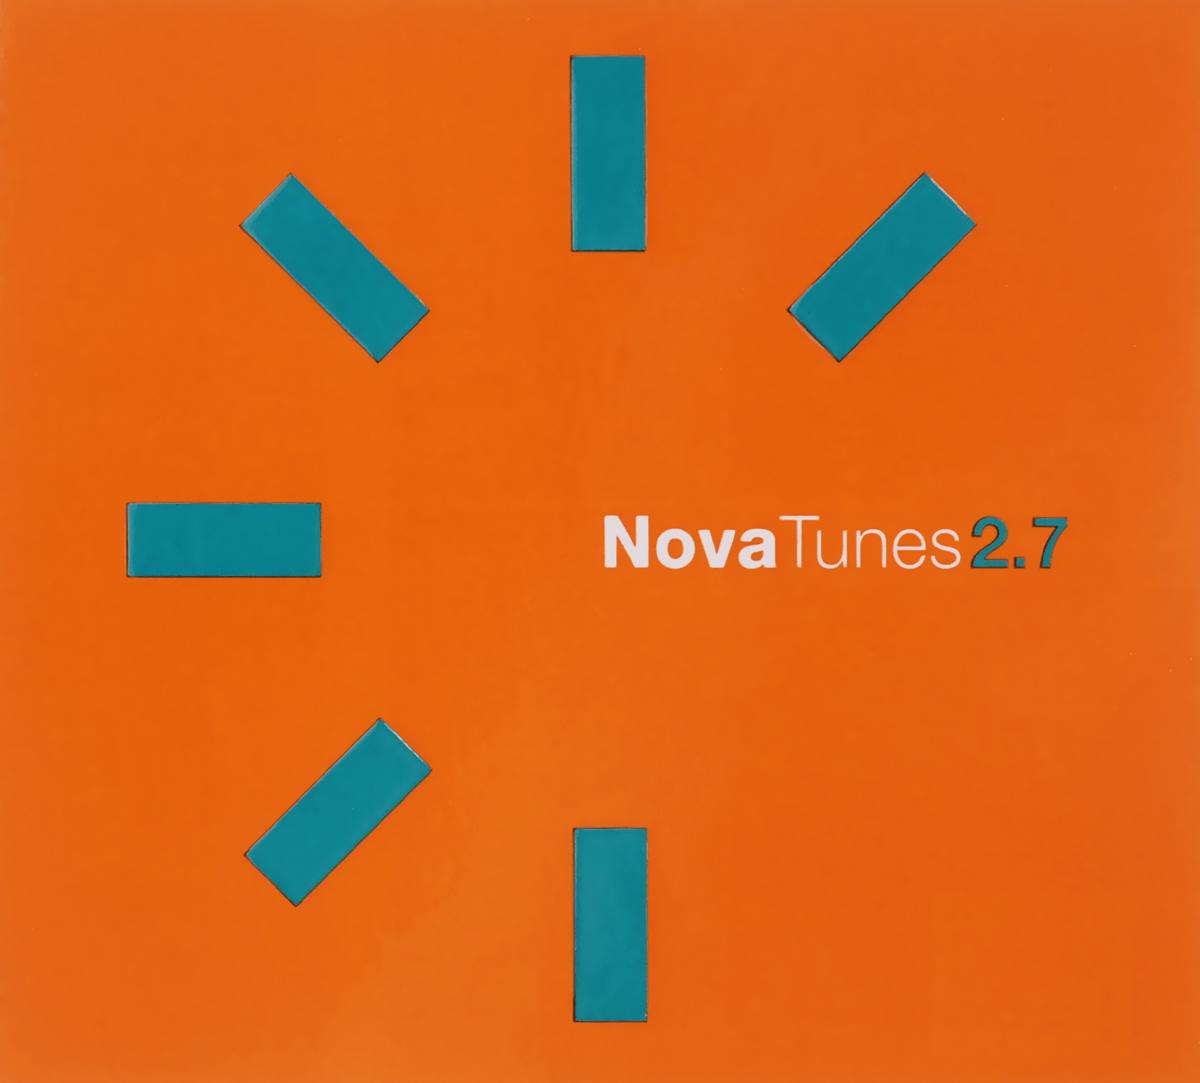 Nova Tunes 2.7 nova tunes 1 7